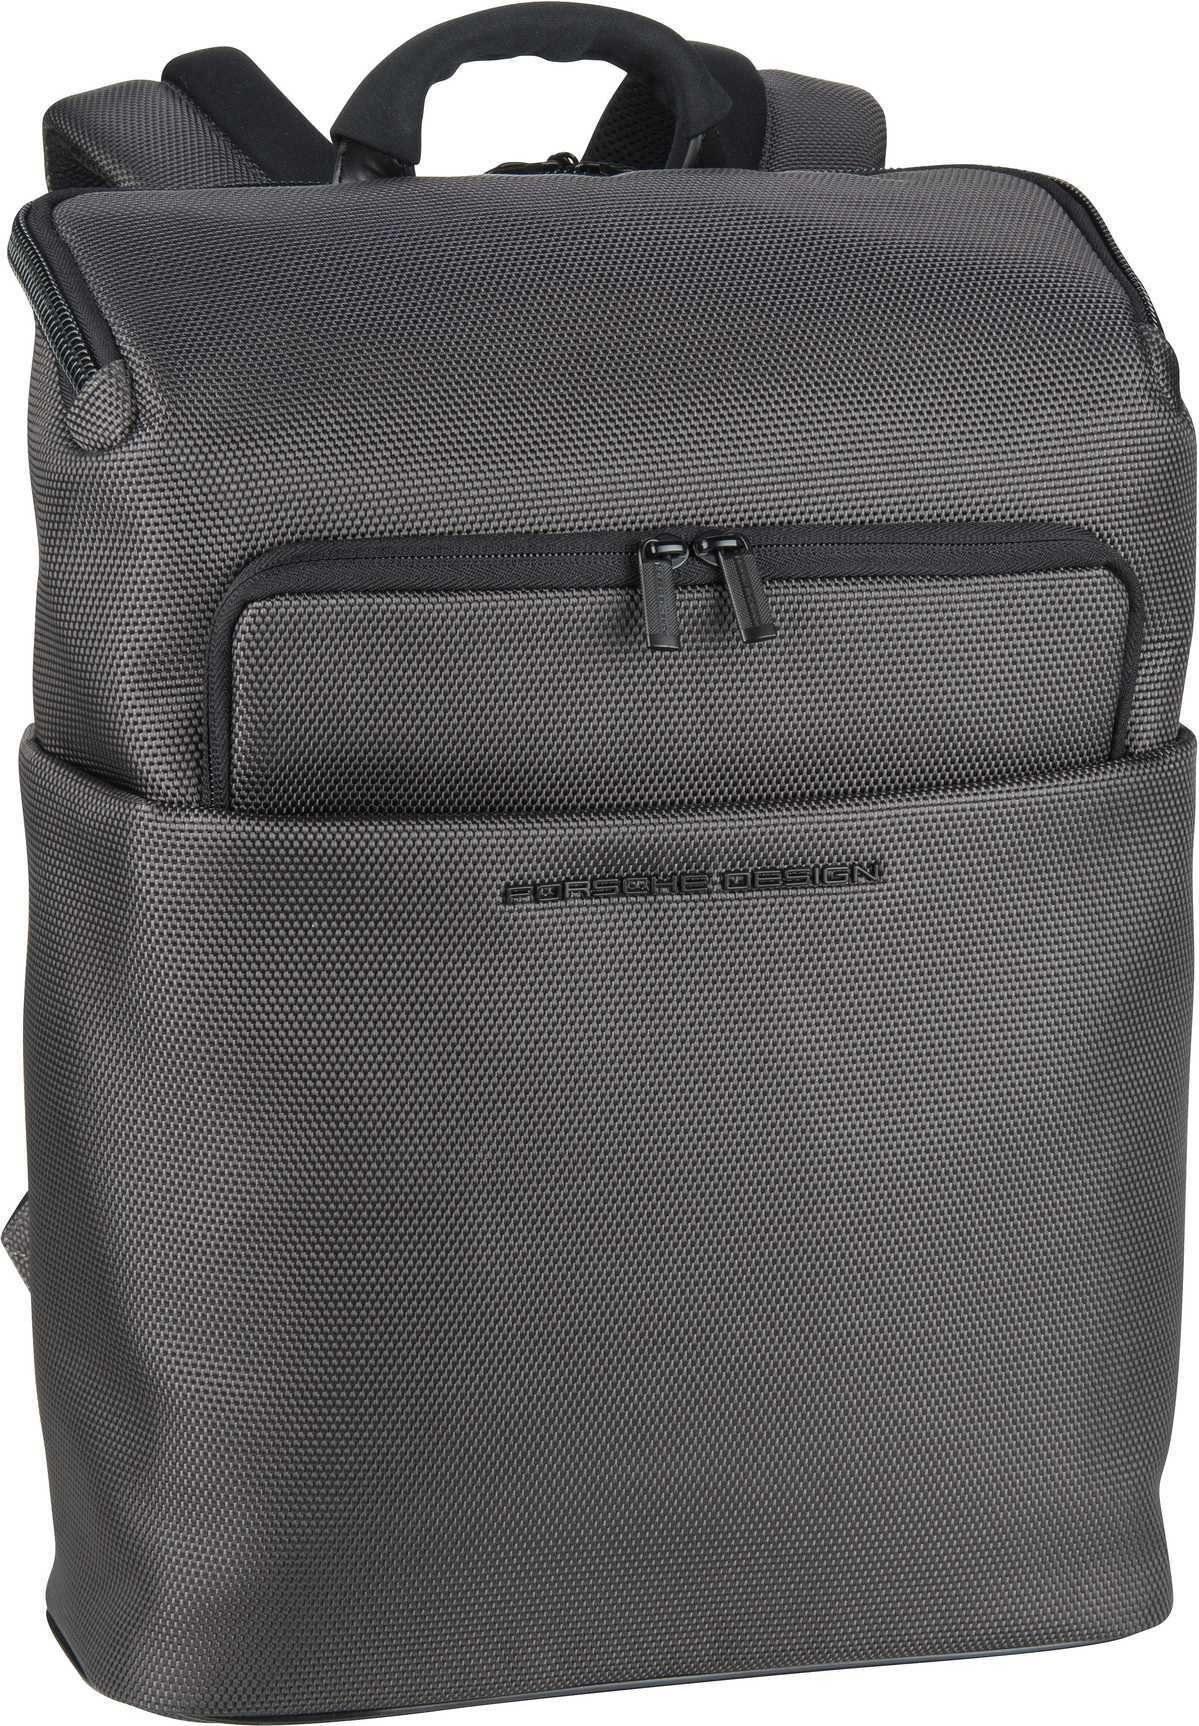 Unisex PORSCHE Design Rucksack / Daypack »Roadster 4.1 BackPack SVZ« grau, schwarz   04053533749355